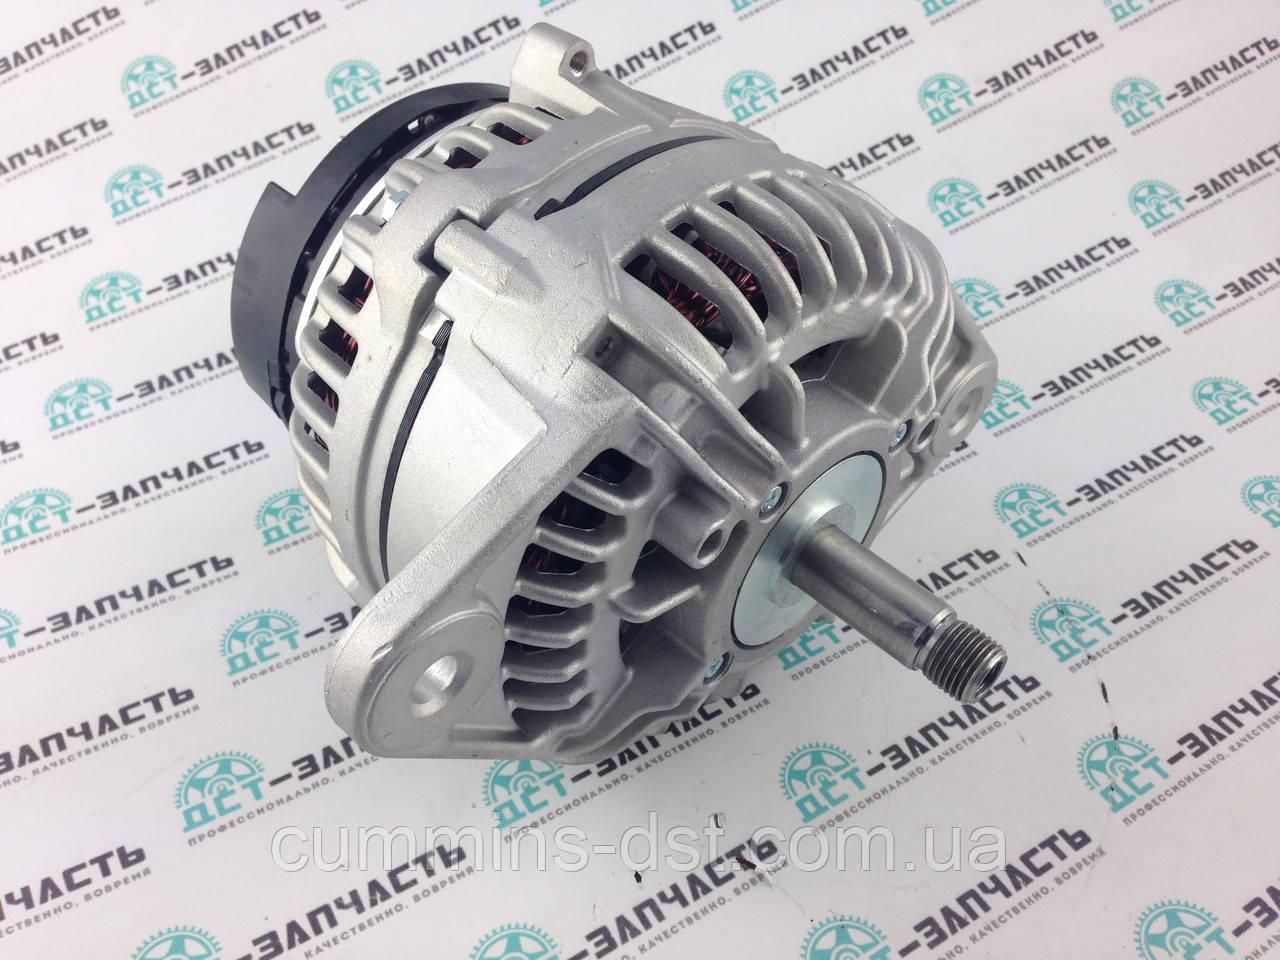 5282839 Генератор на двигатель Сummins 4B-3.9/6B-5.9/6C/QSB/QSC/ISC/QSL